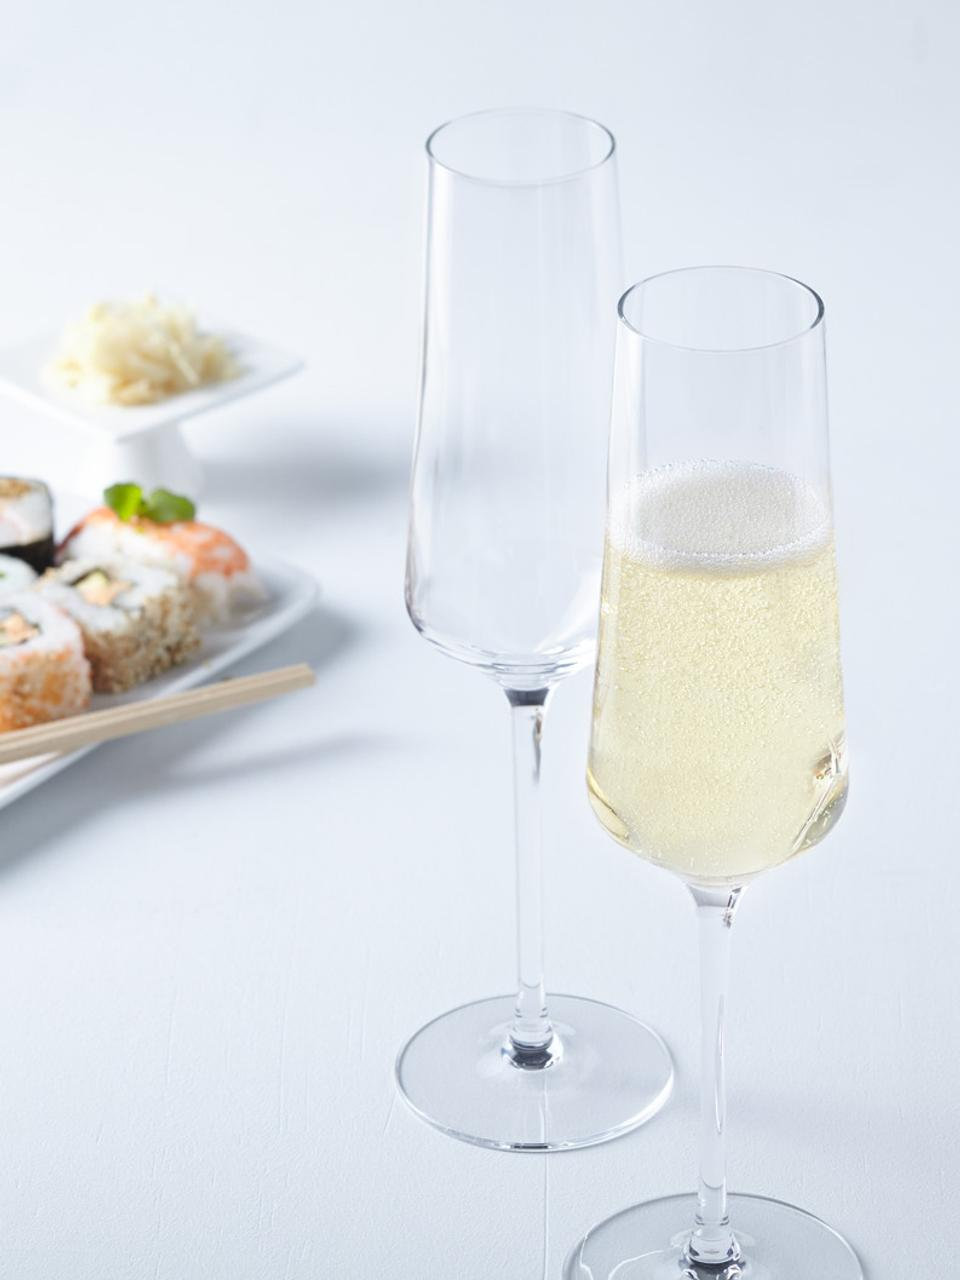 Sekt- und Champagnergläser Puccini, 6er-Set, Teqton®-Glas, Transparent, Ø 7 x H 26 cm